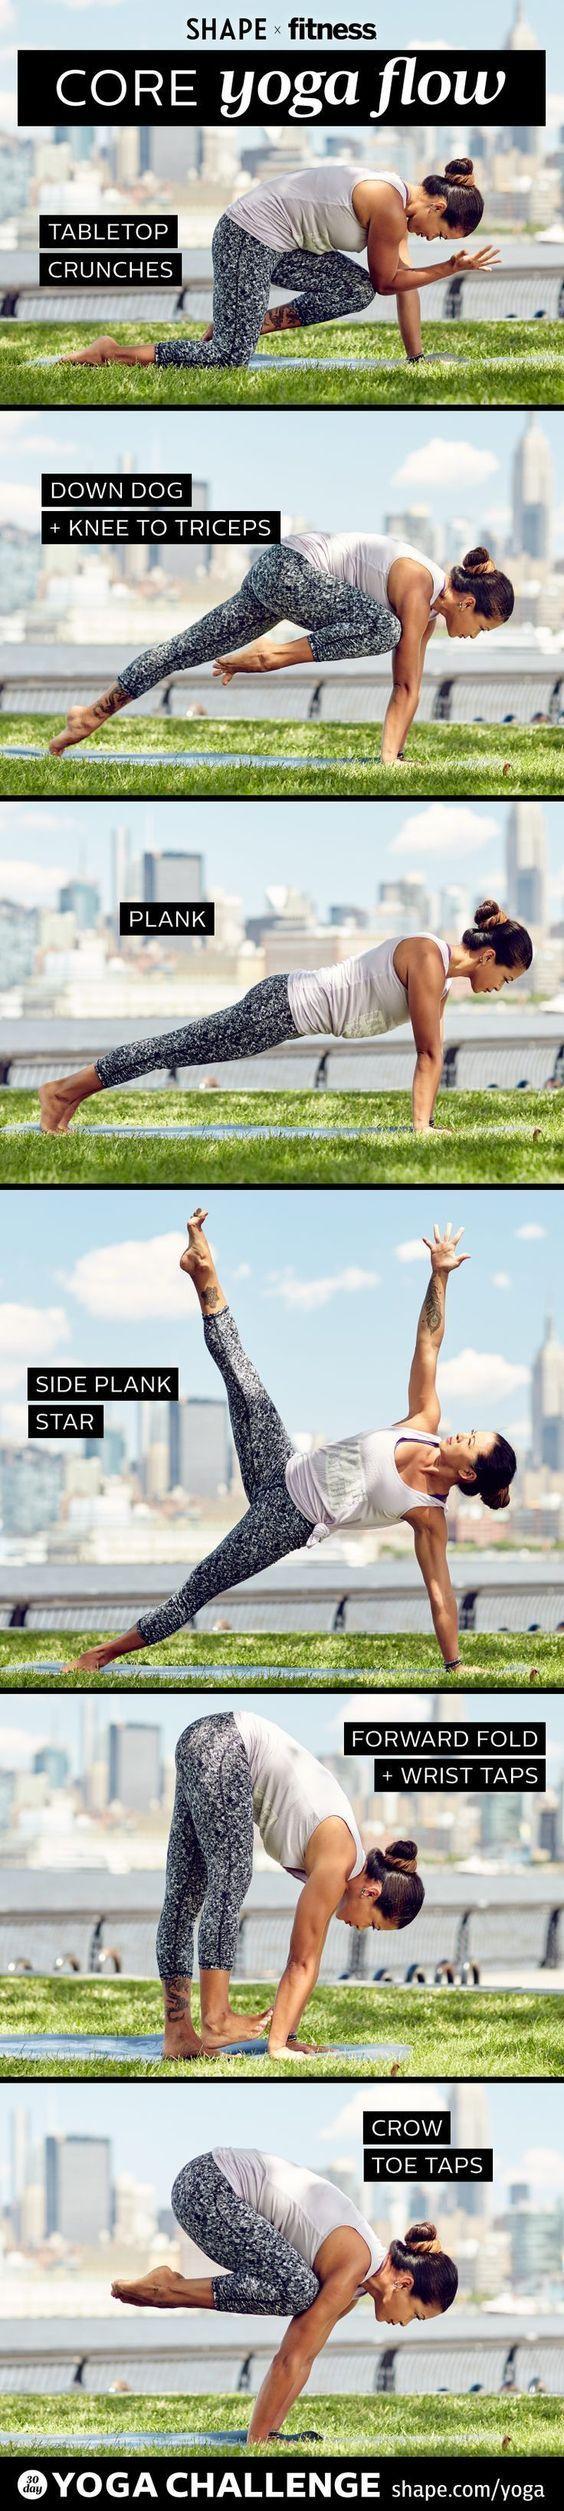 DownDog Yoga Poses for Fun & Fitness: Core Yoga Flow